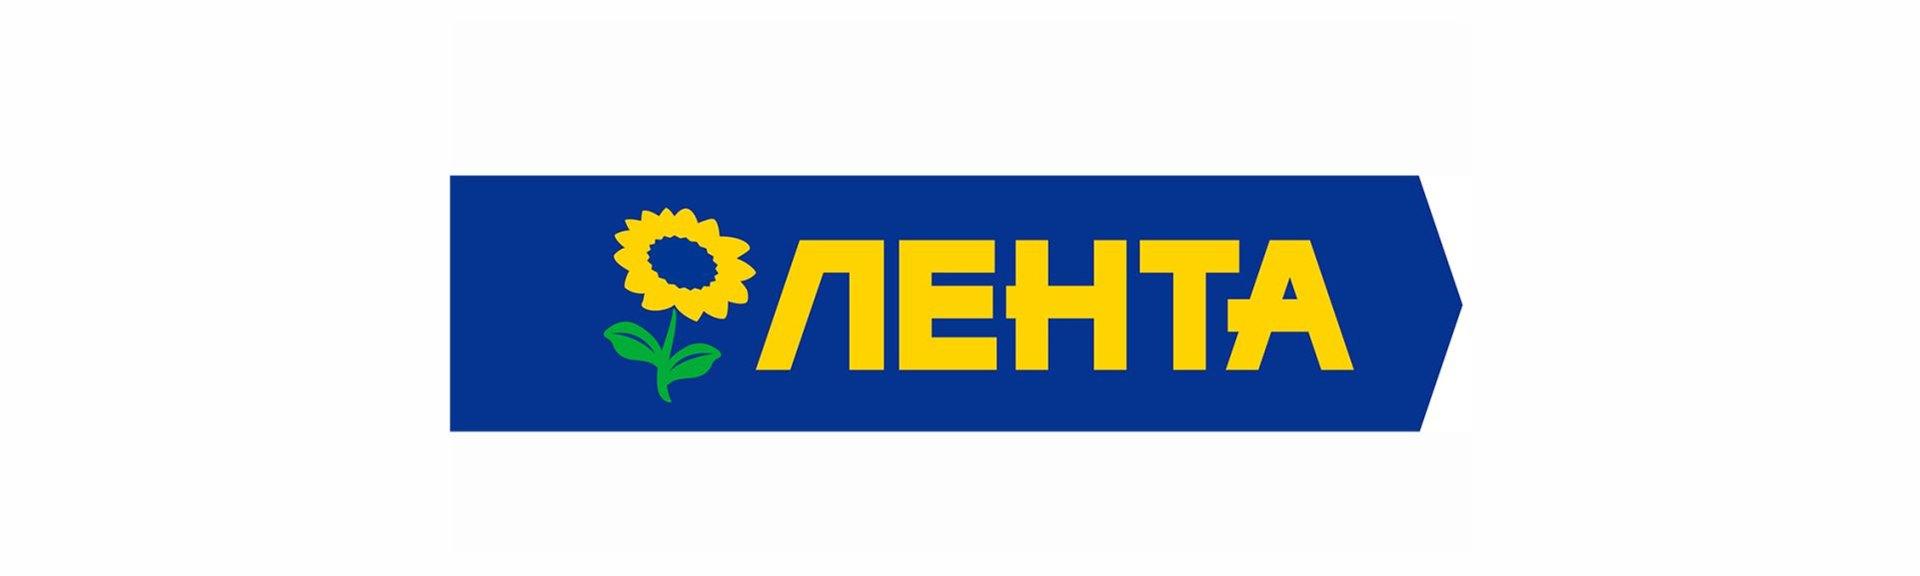 https://www.almazcom.ru/pub/img/QA/346/gipermarkety_Lenta.jpg